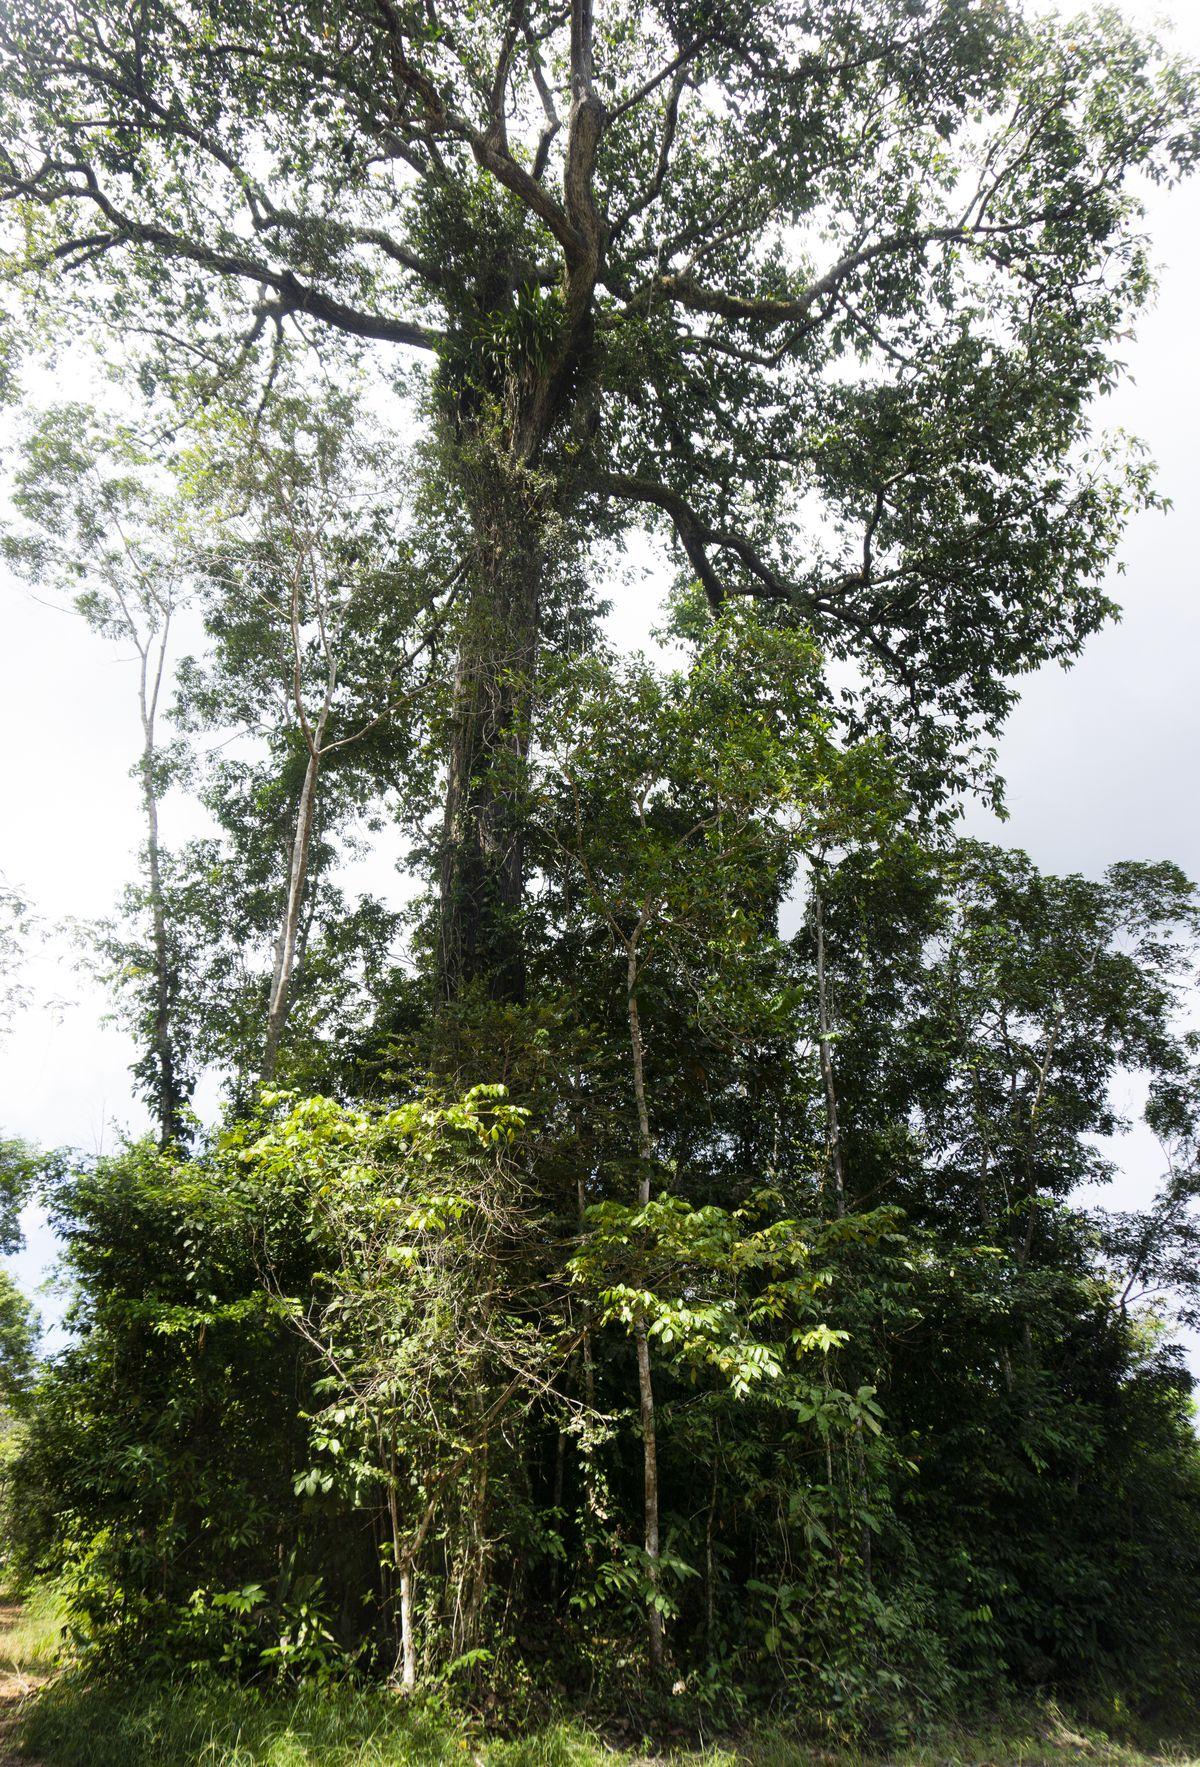 A Brazil nut tree, Bertholletia excelsa, in the Amazon rainforest.